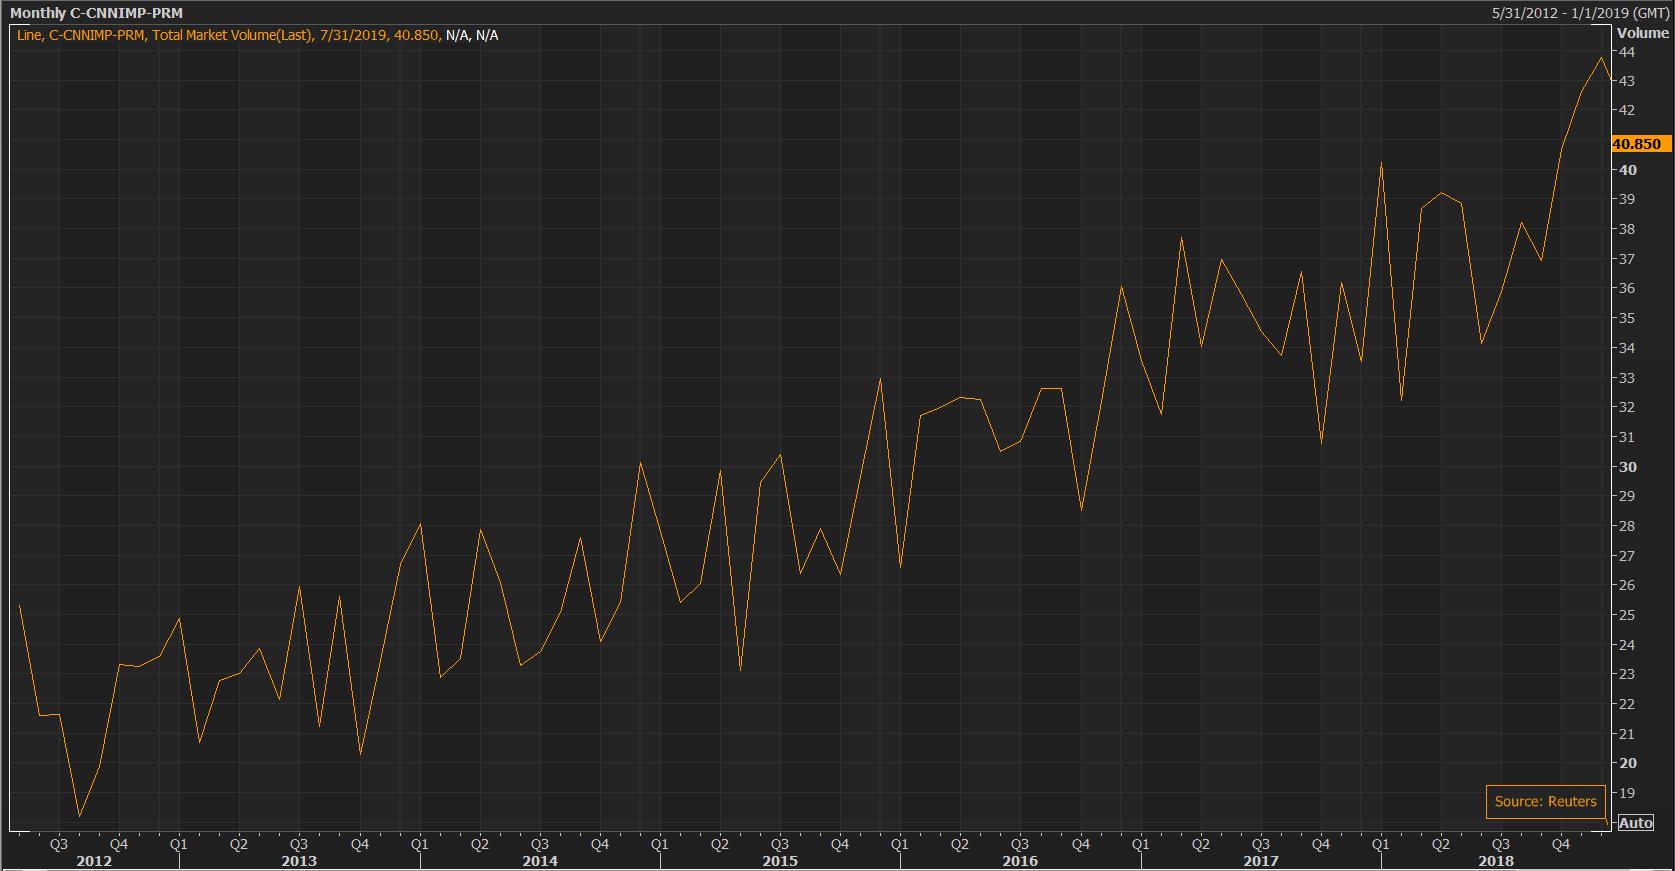 China Net Oil Imports